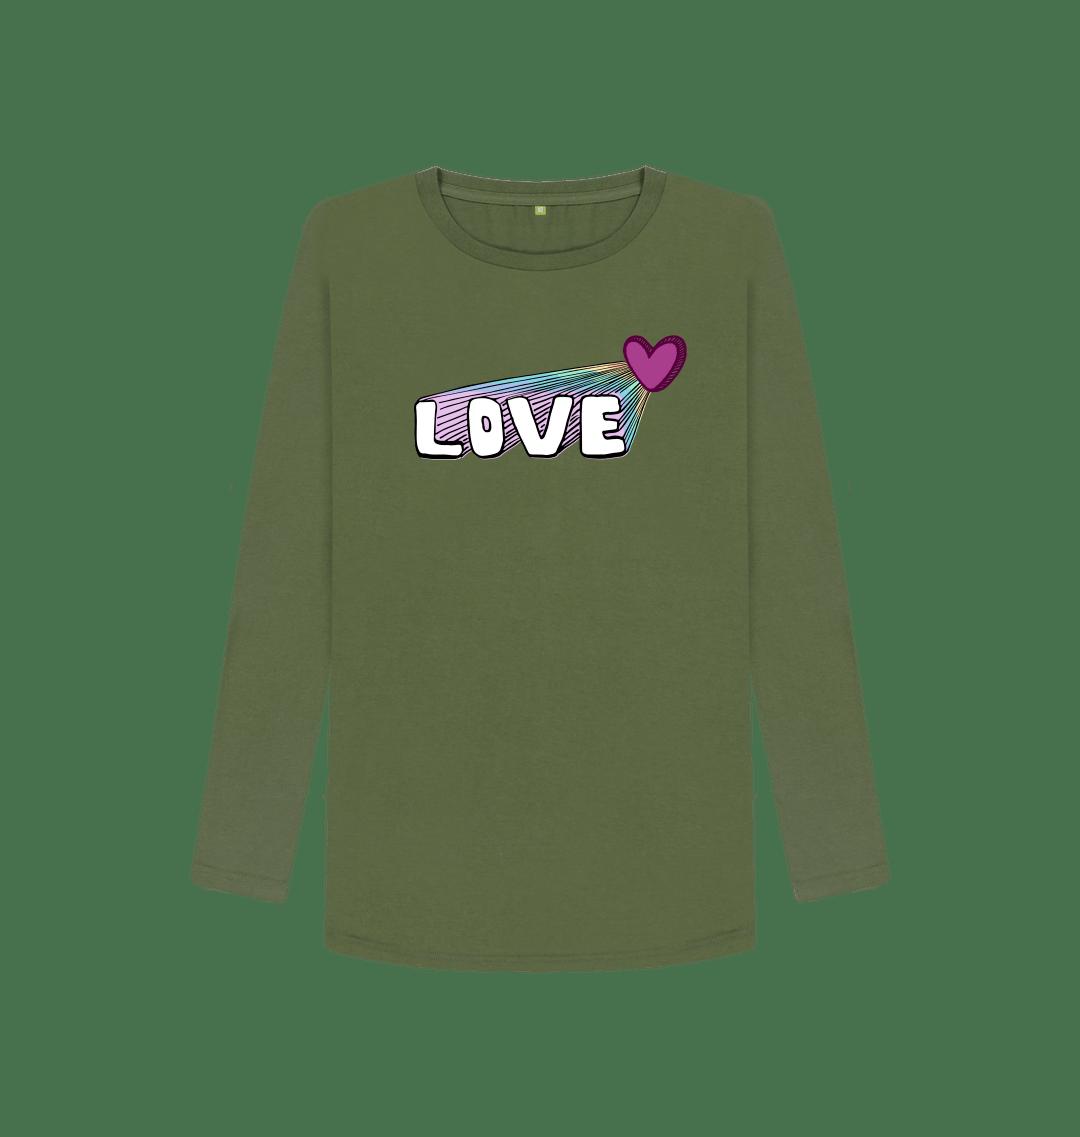 Organic Cotton Women's Let Your Love Shine Longsleeve Top in Khaki Green